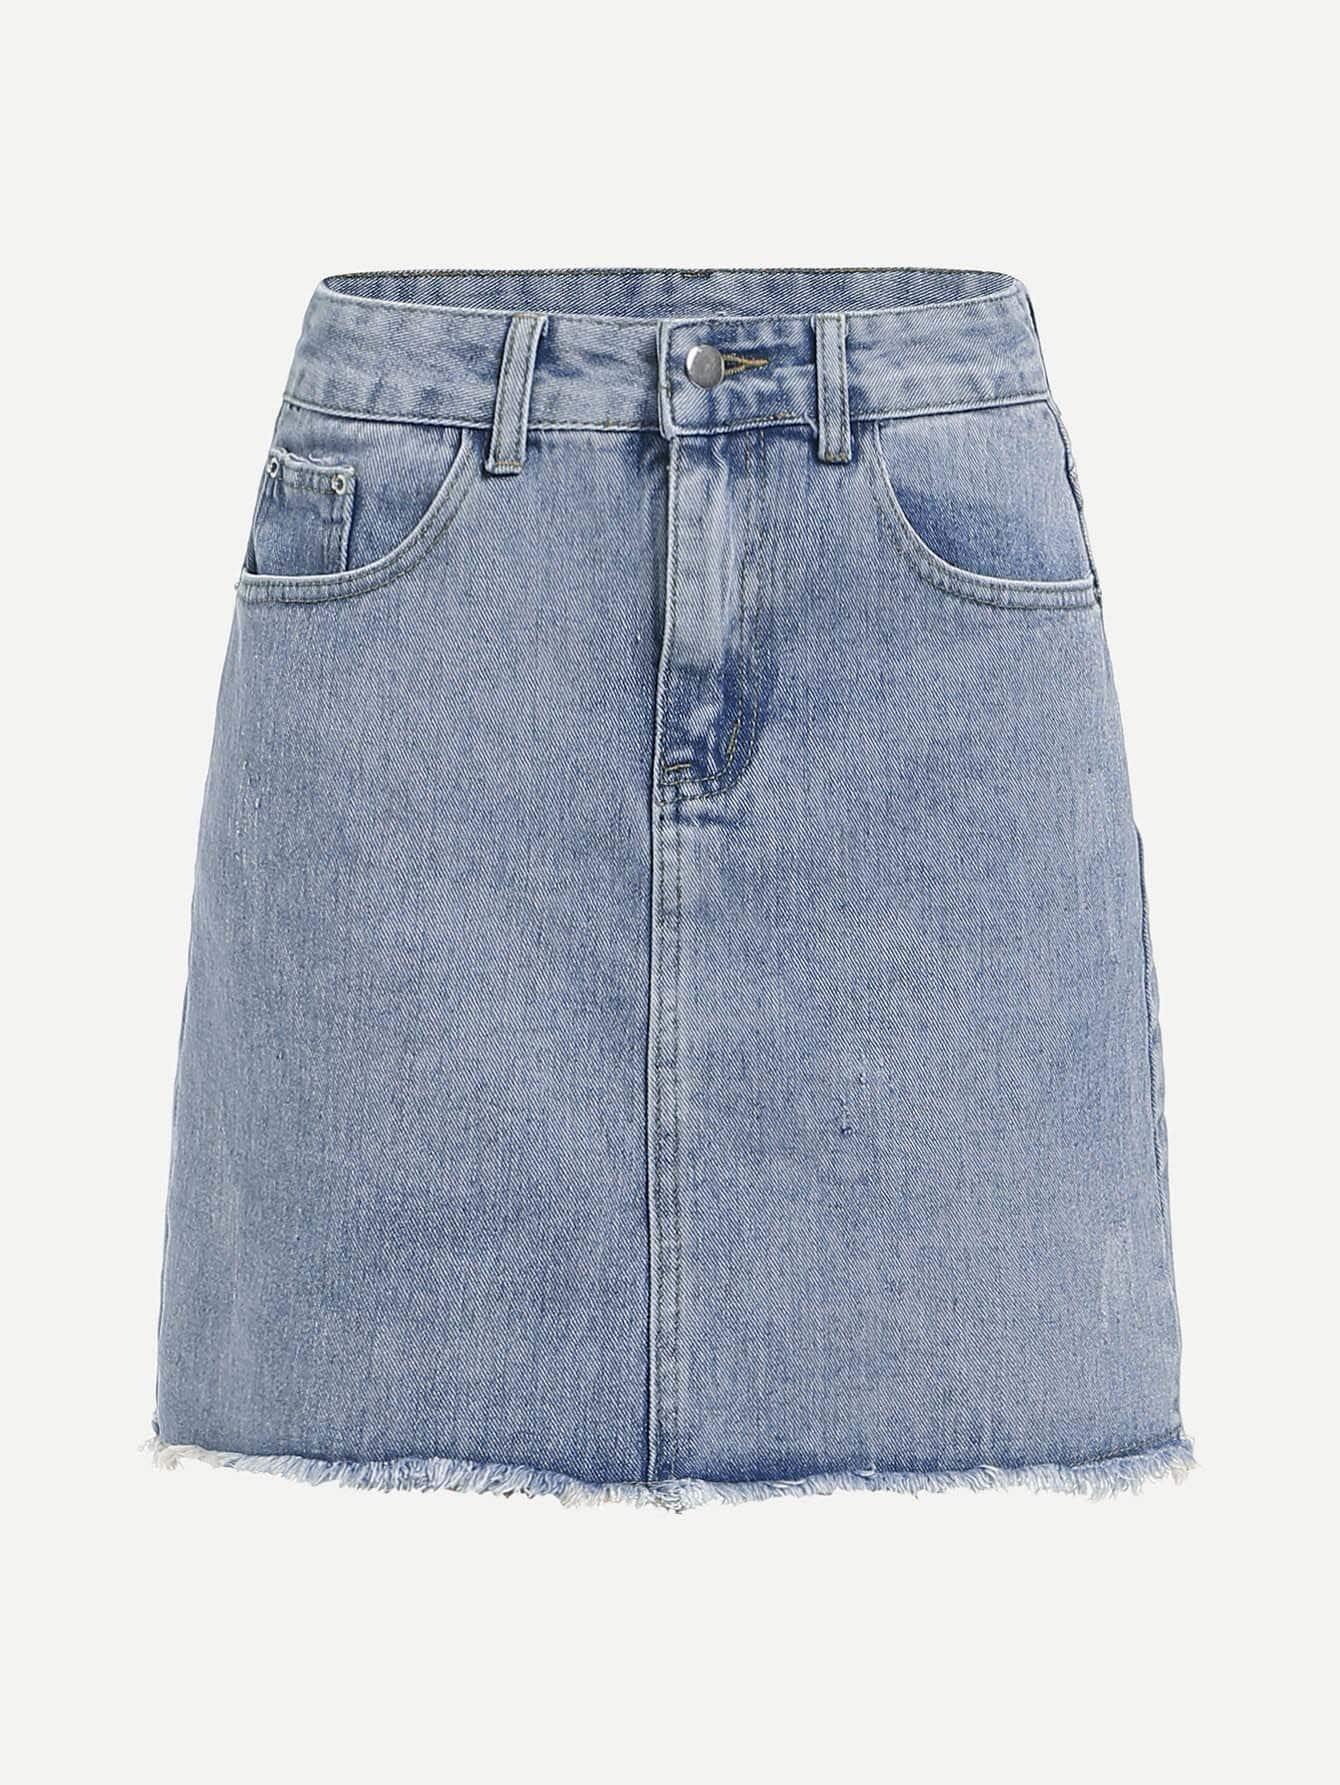 Bleach Wash Raw Hem Denim Skirt girls single breasted raw hem skirt